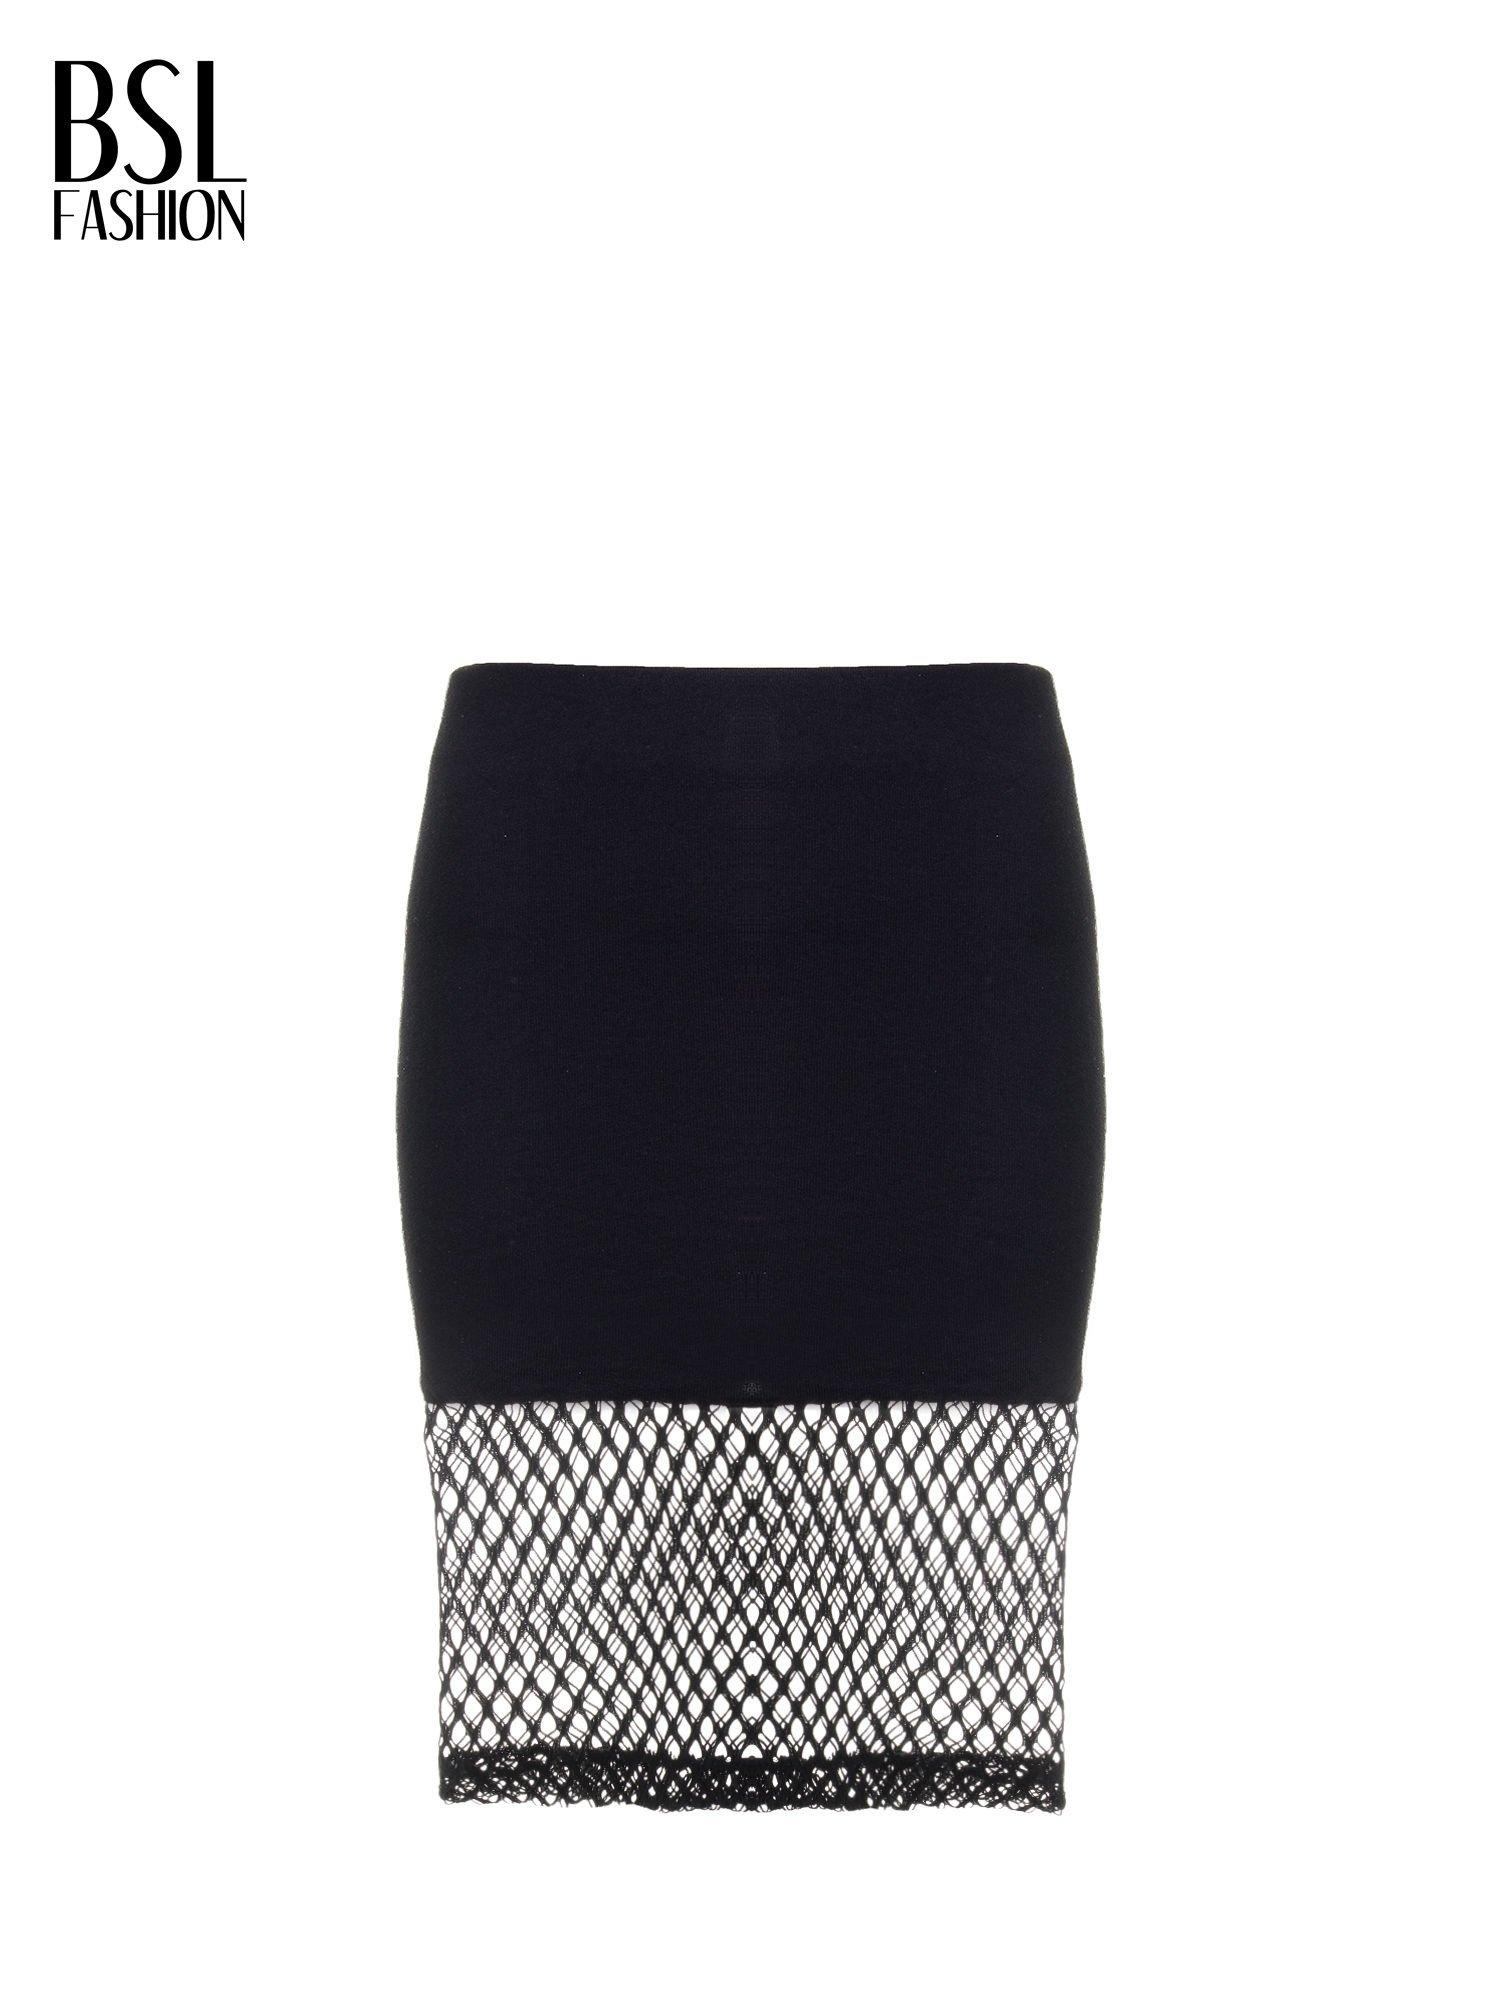 Czarna spódnica do kolan z siatki                                  zdj.                                  4